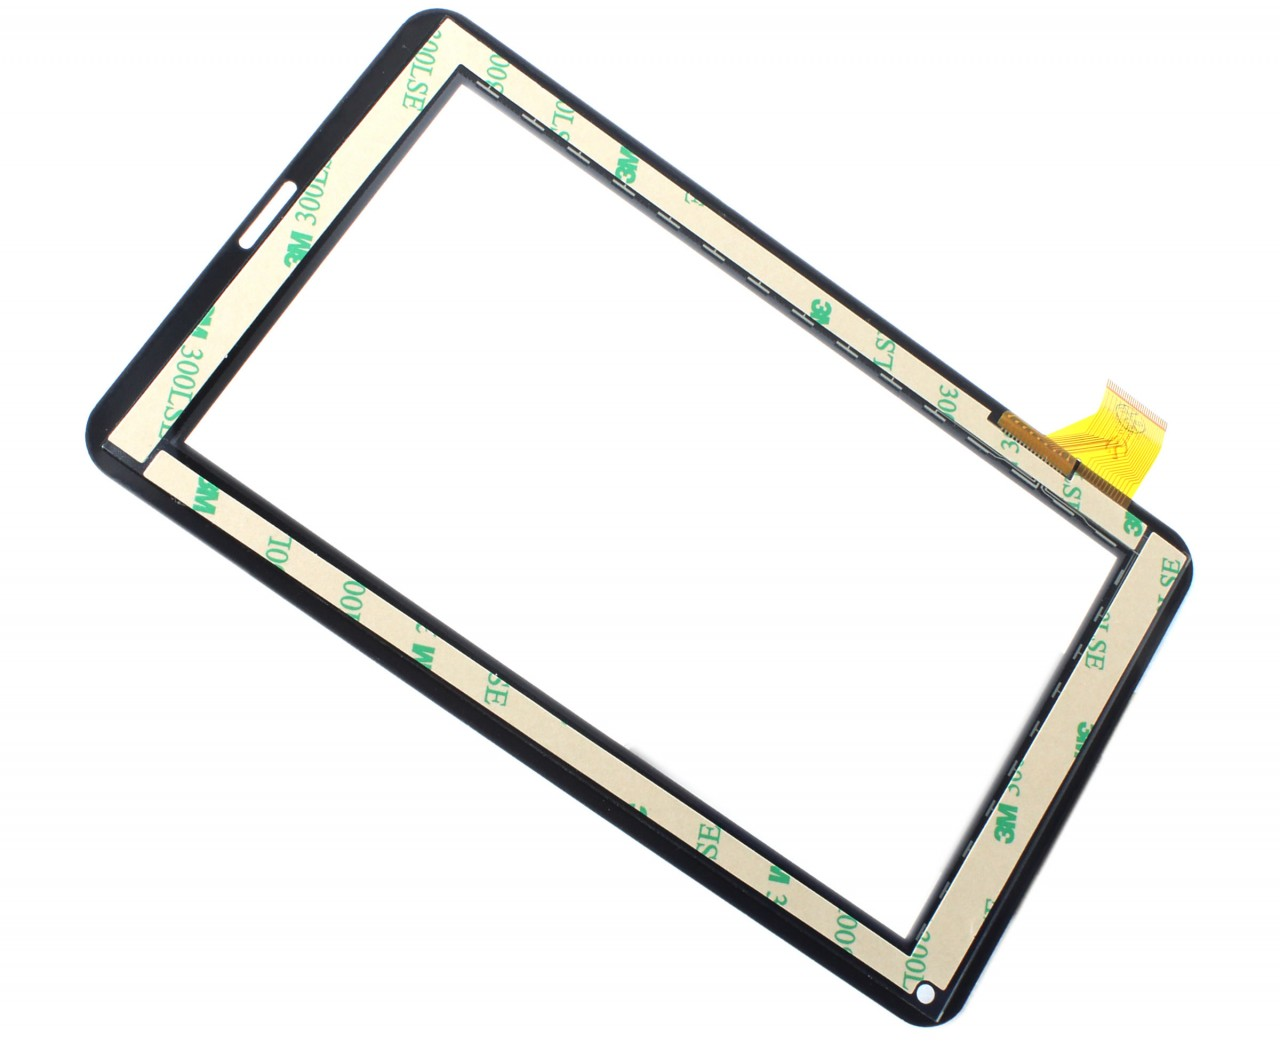 Touchscreen Digitizer Mercury mTAB7 Geam Sticla Tableta imagine powerlaptop.ro 2021